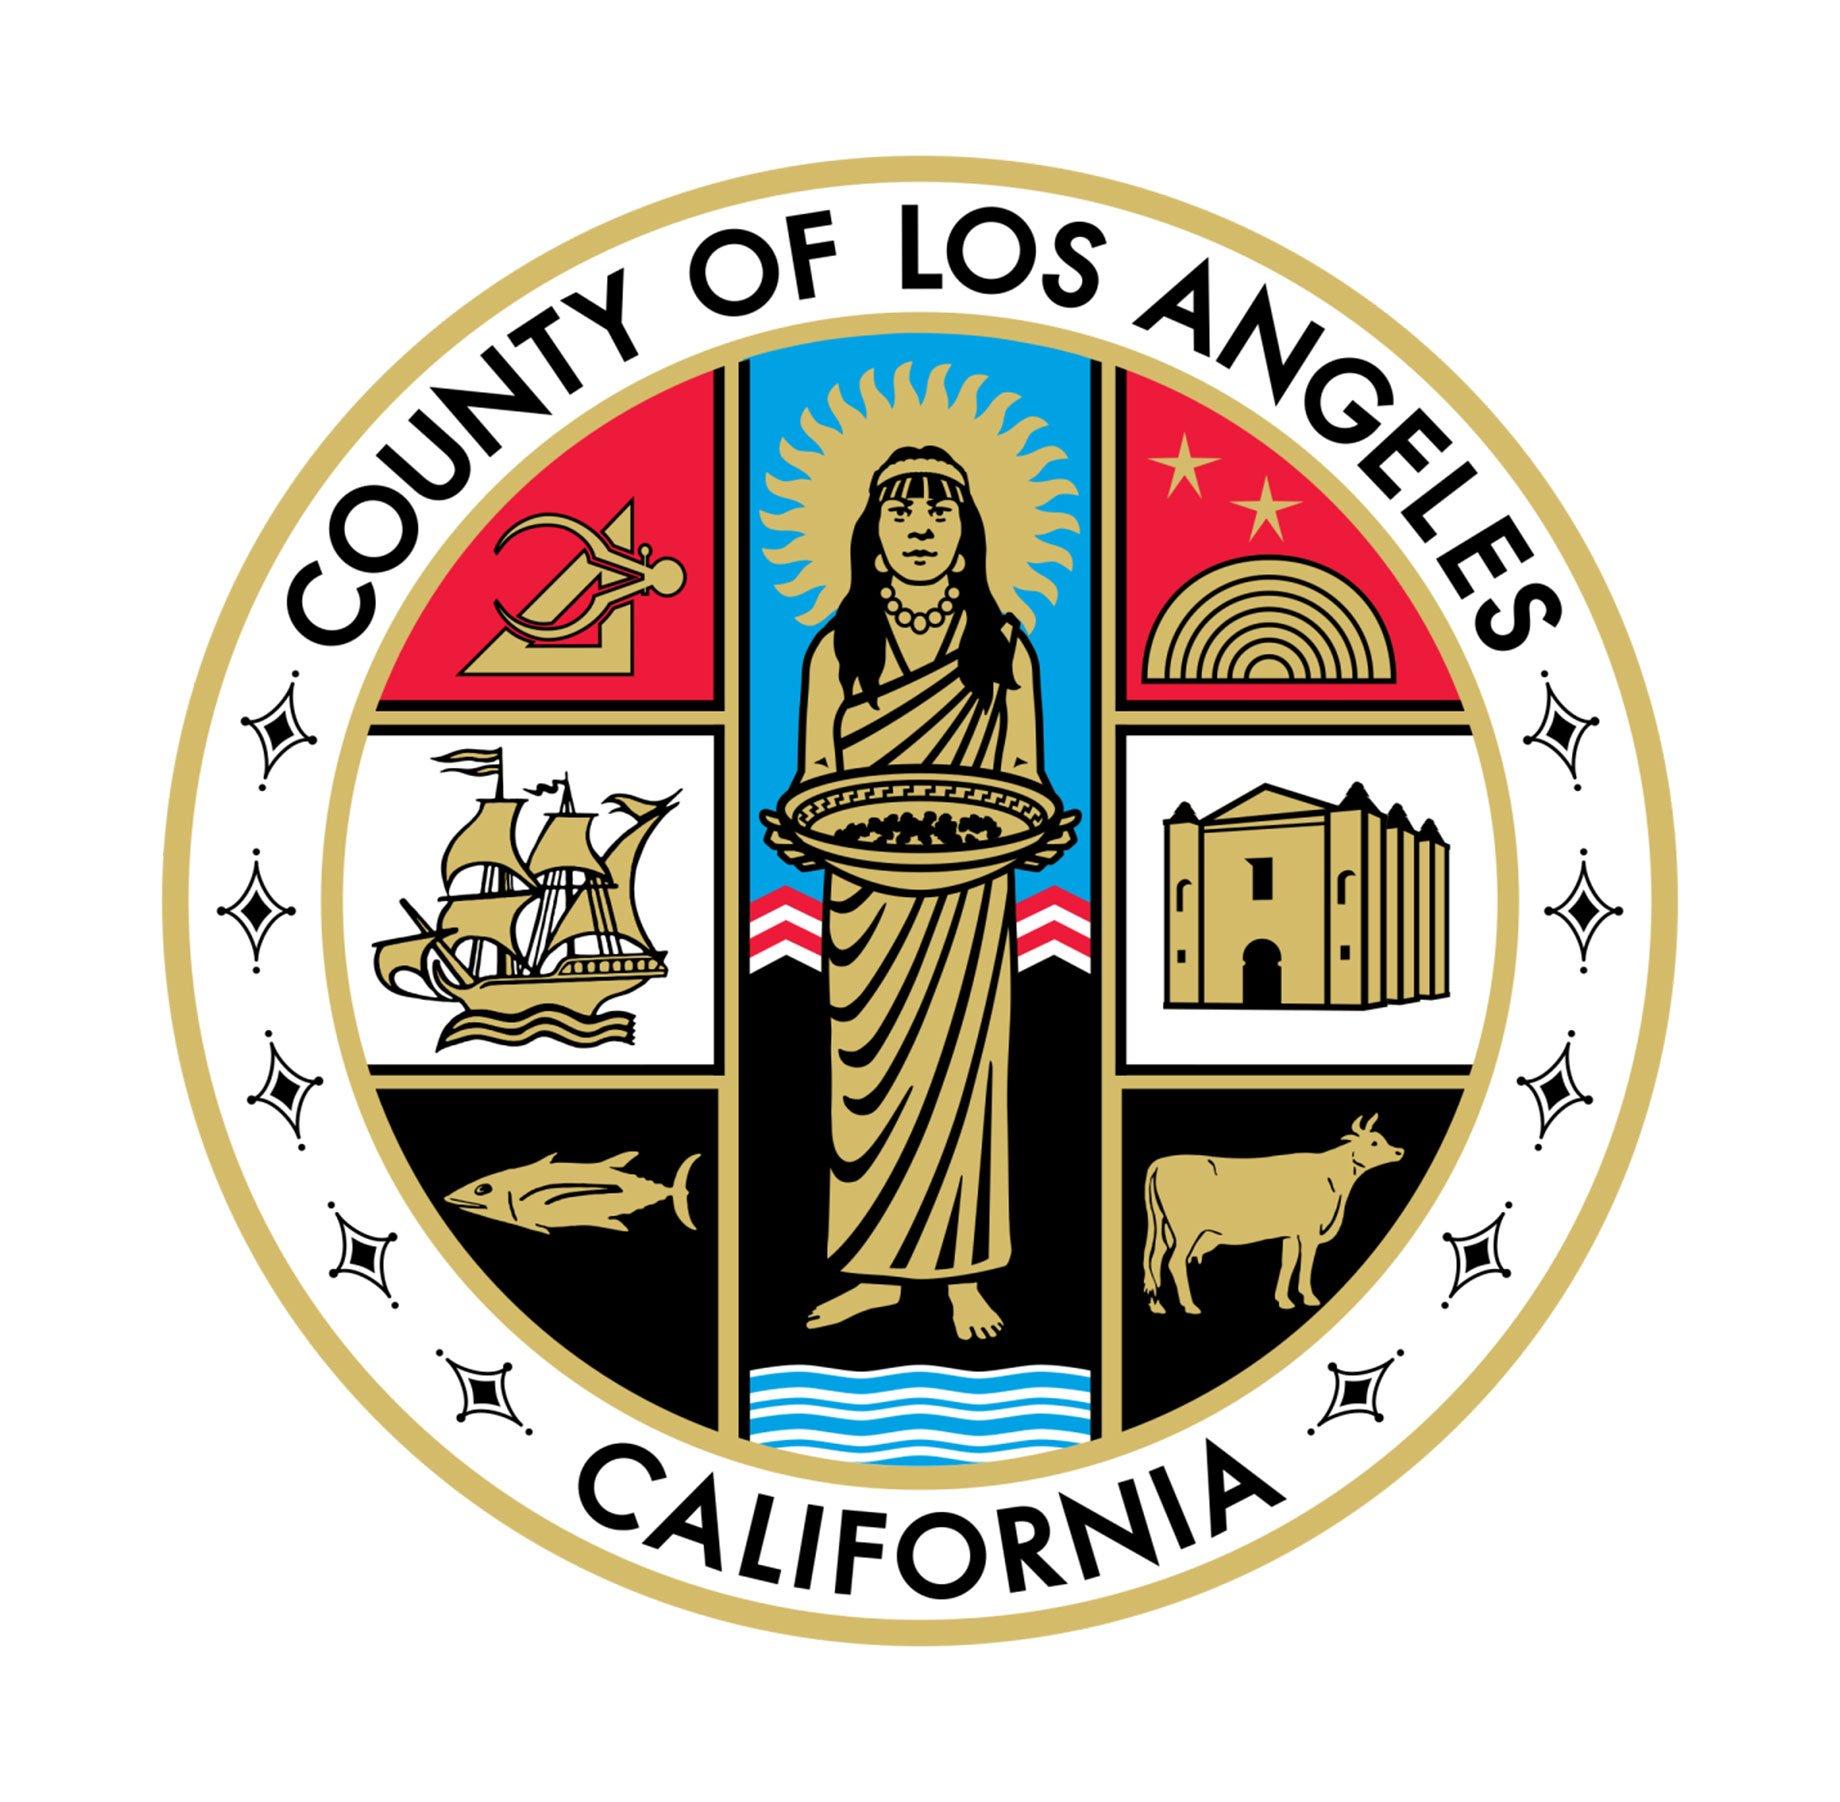 County of La